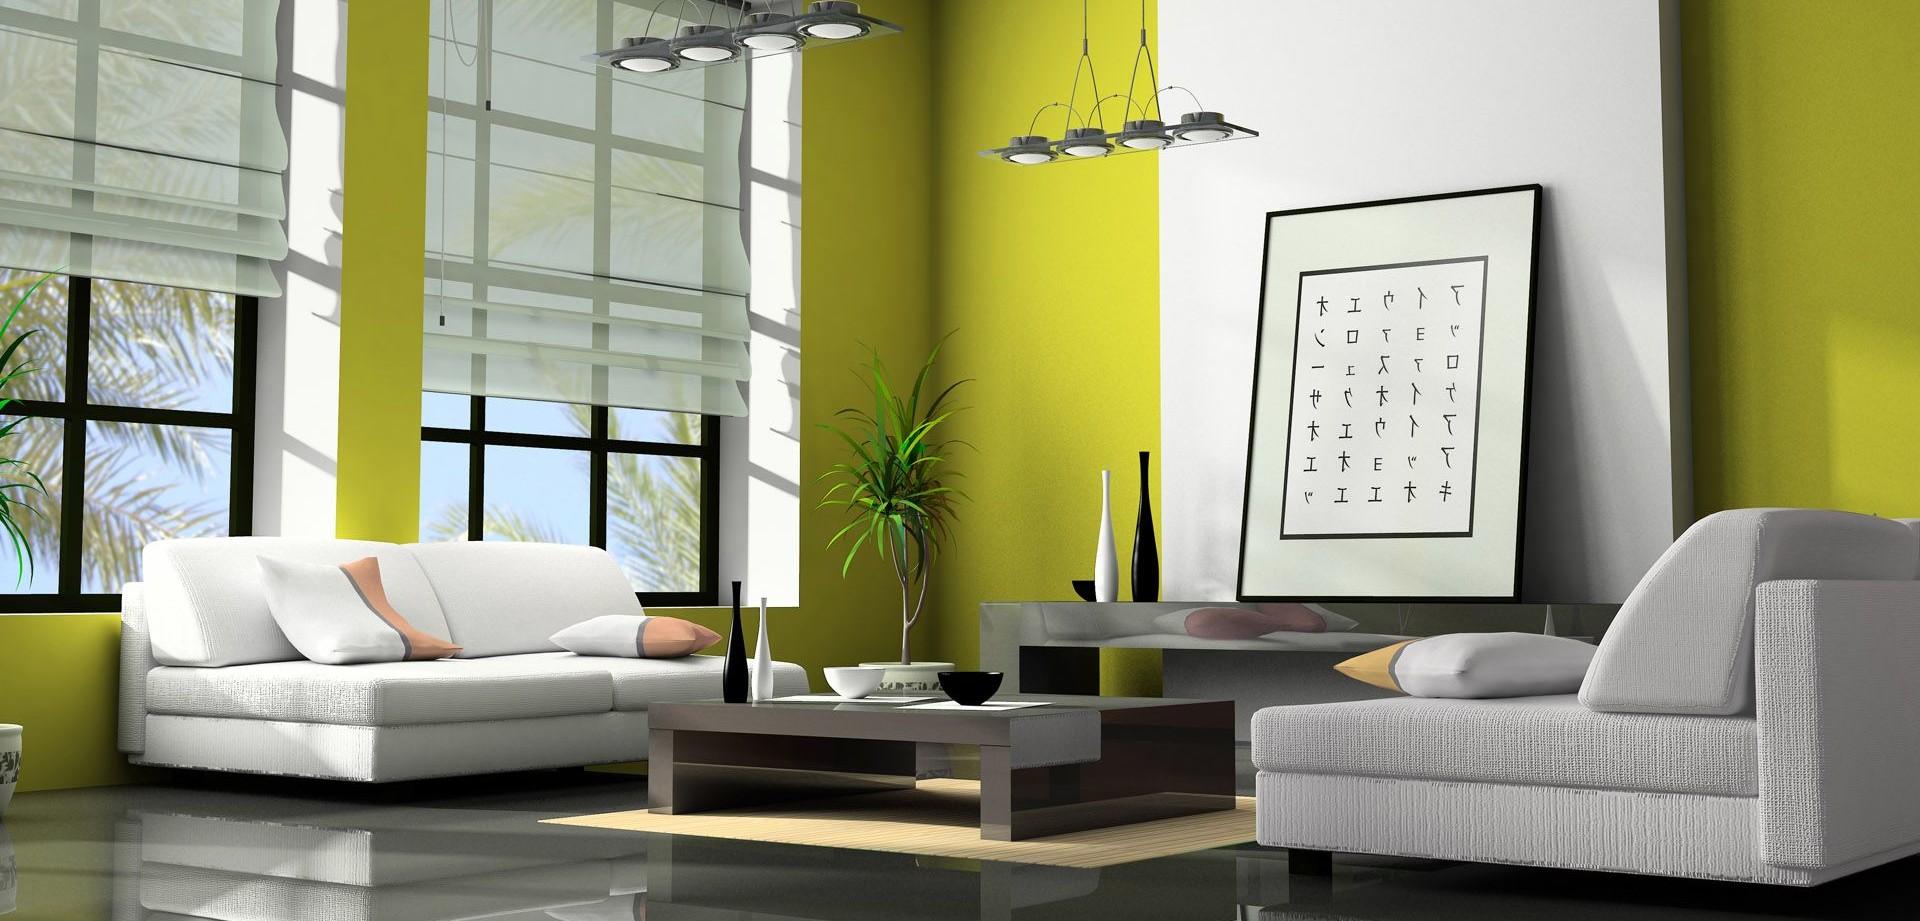 Consigli Per La Casa feng shui: consigli per la casa - green.it